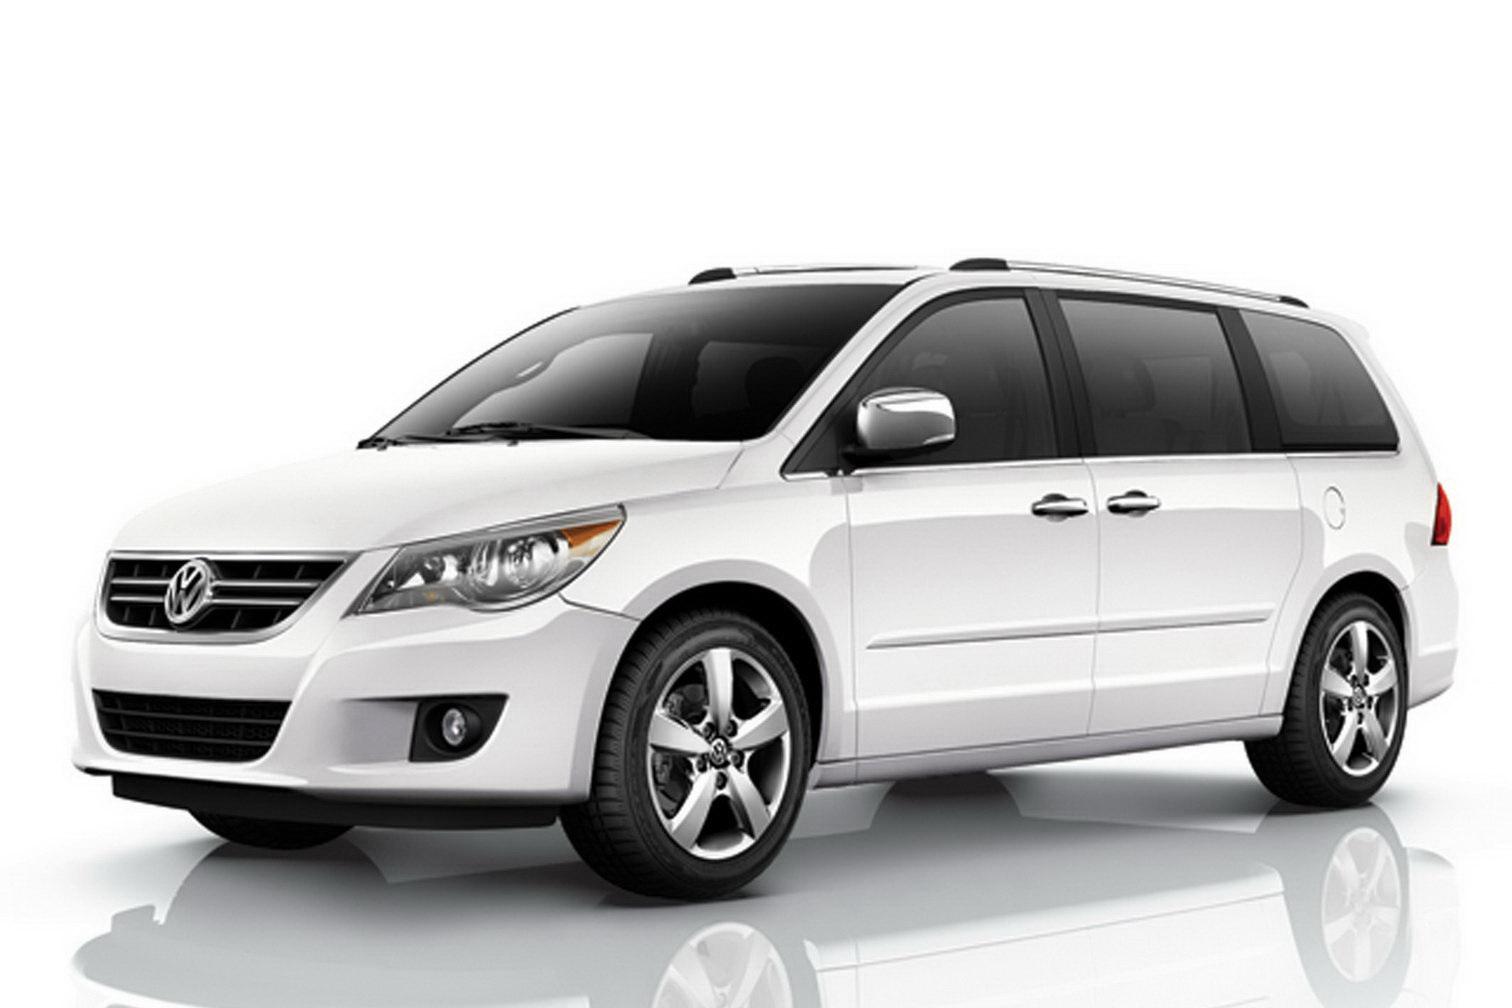 volkswagen usa recalling almost 16 000 routan minivans for fire hazard. Black Bedroom Furniture Sets. Home Design Ideas